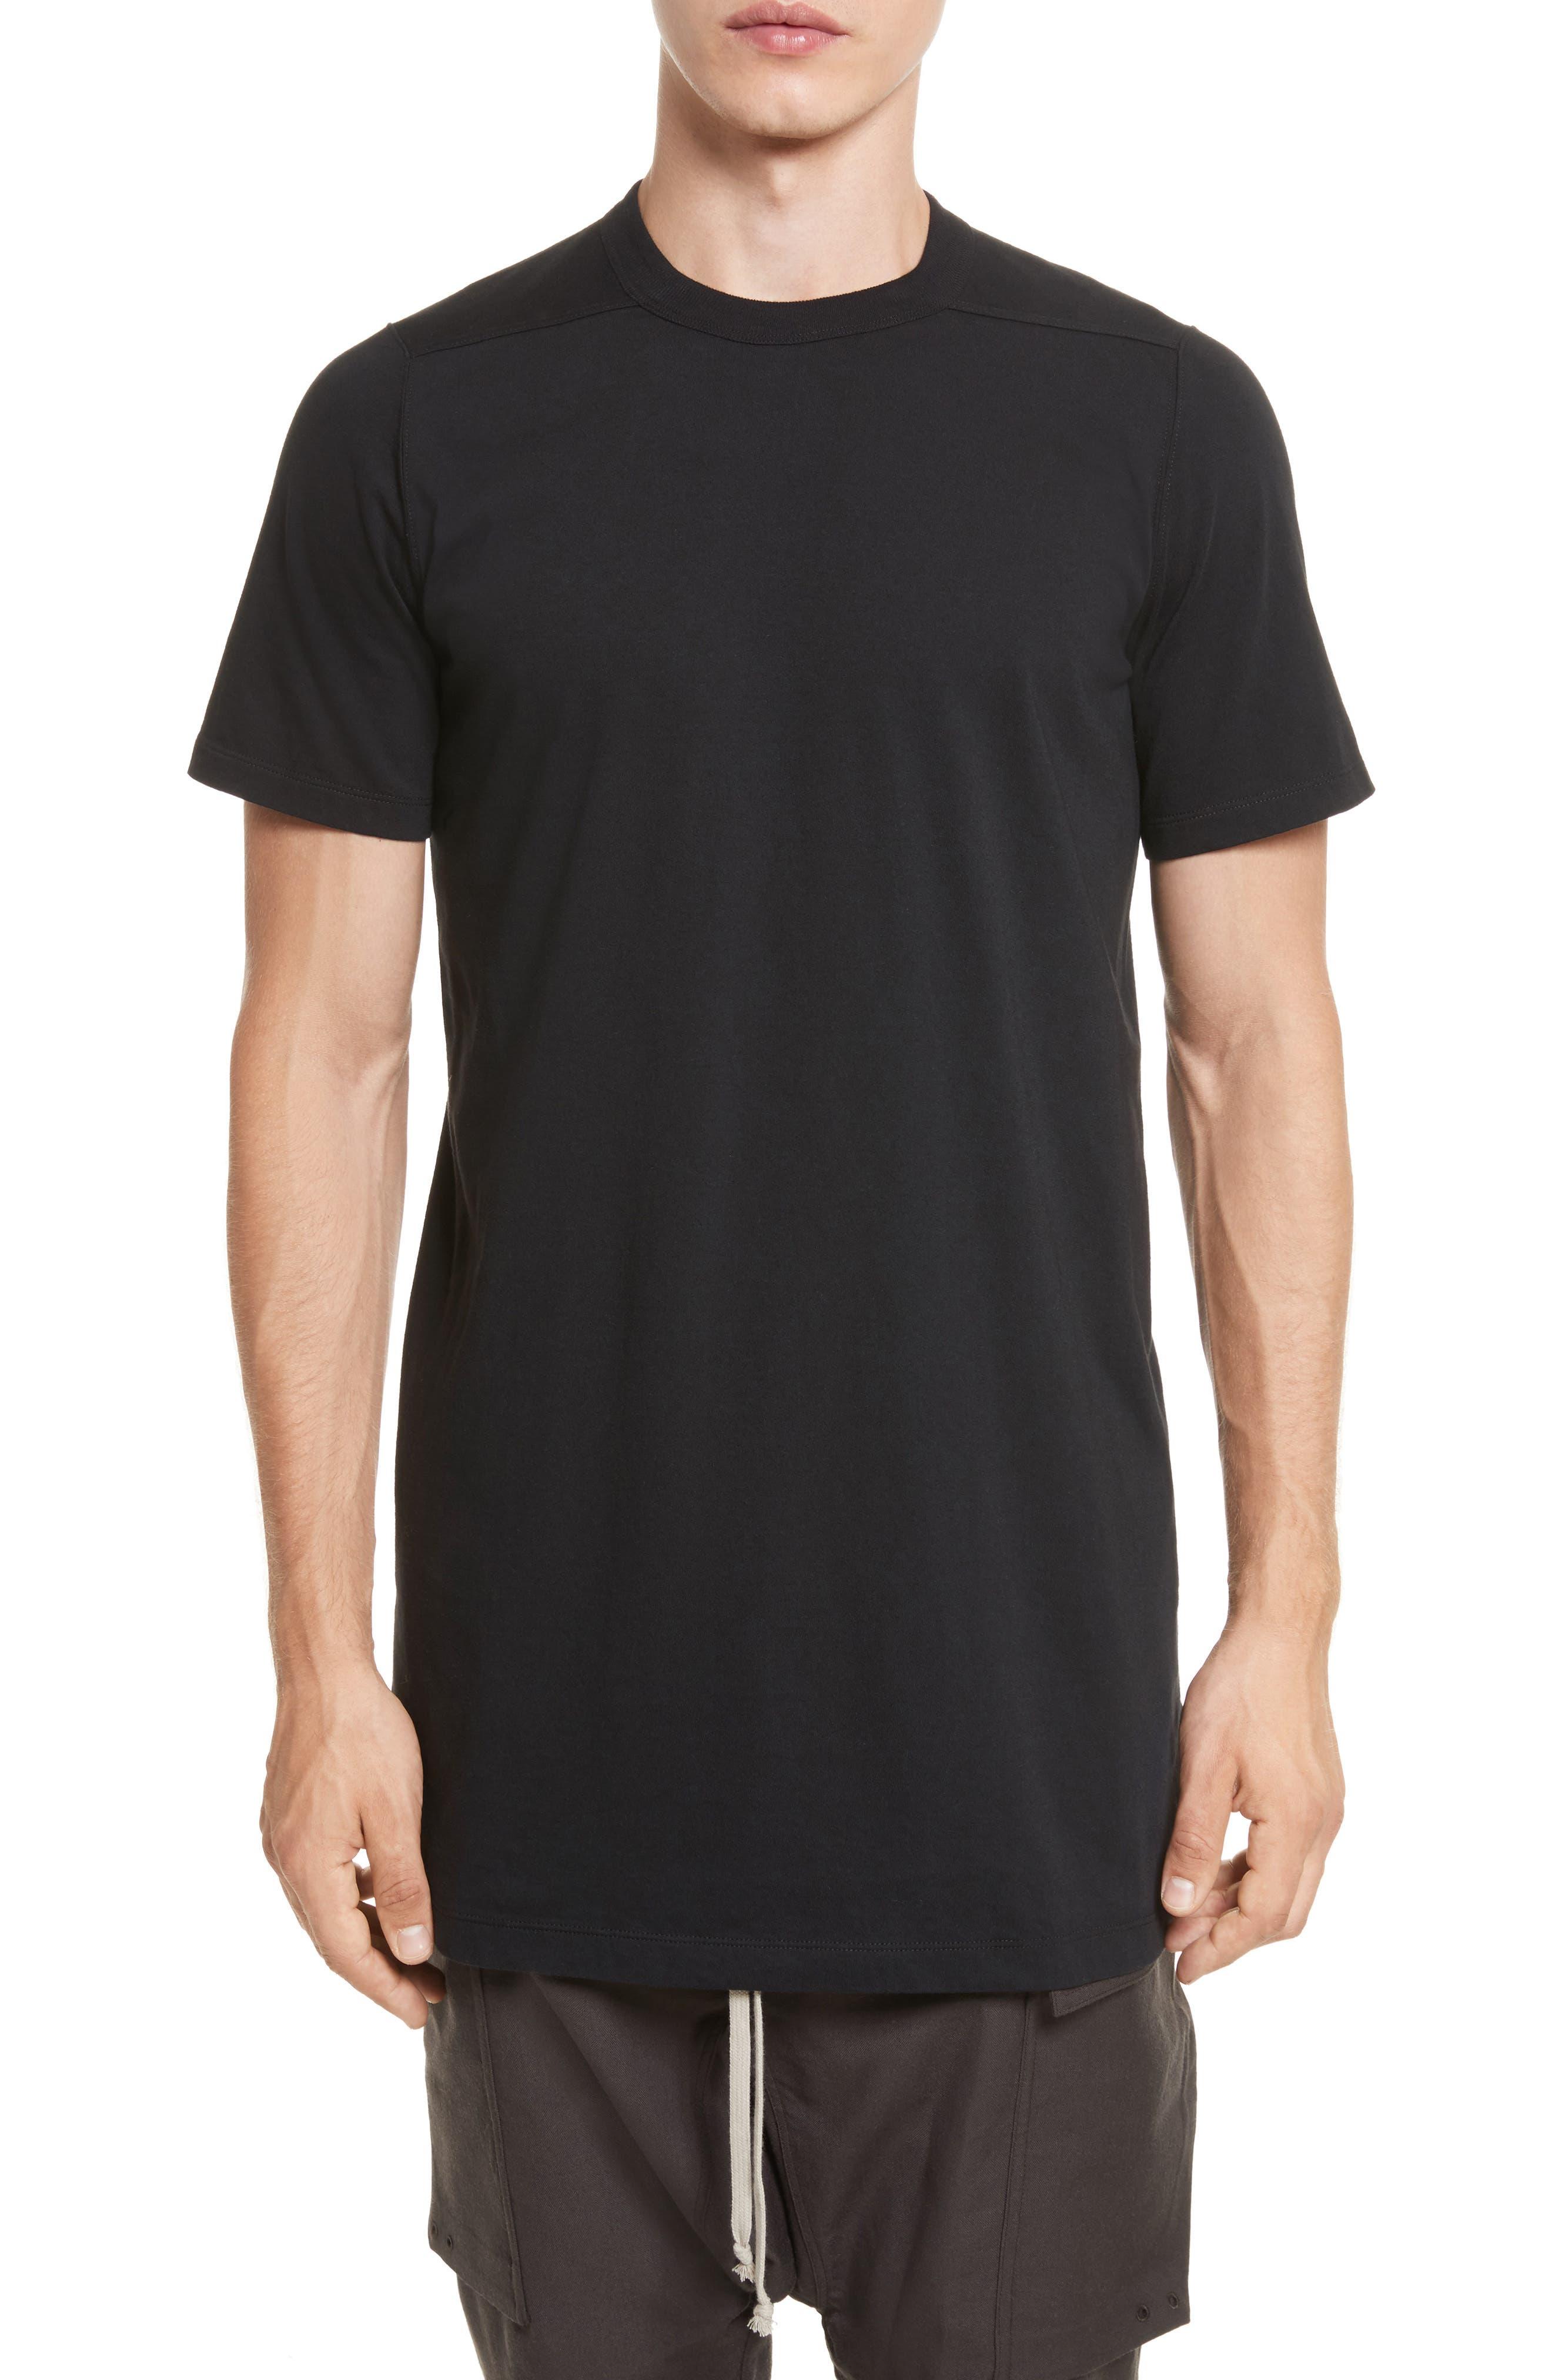 Rick Owens Elongated T-Shirt